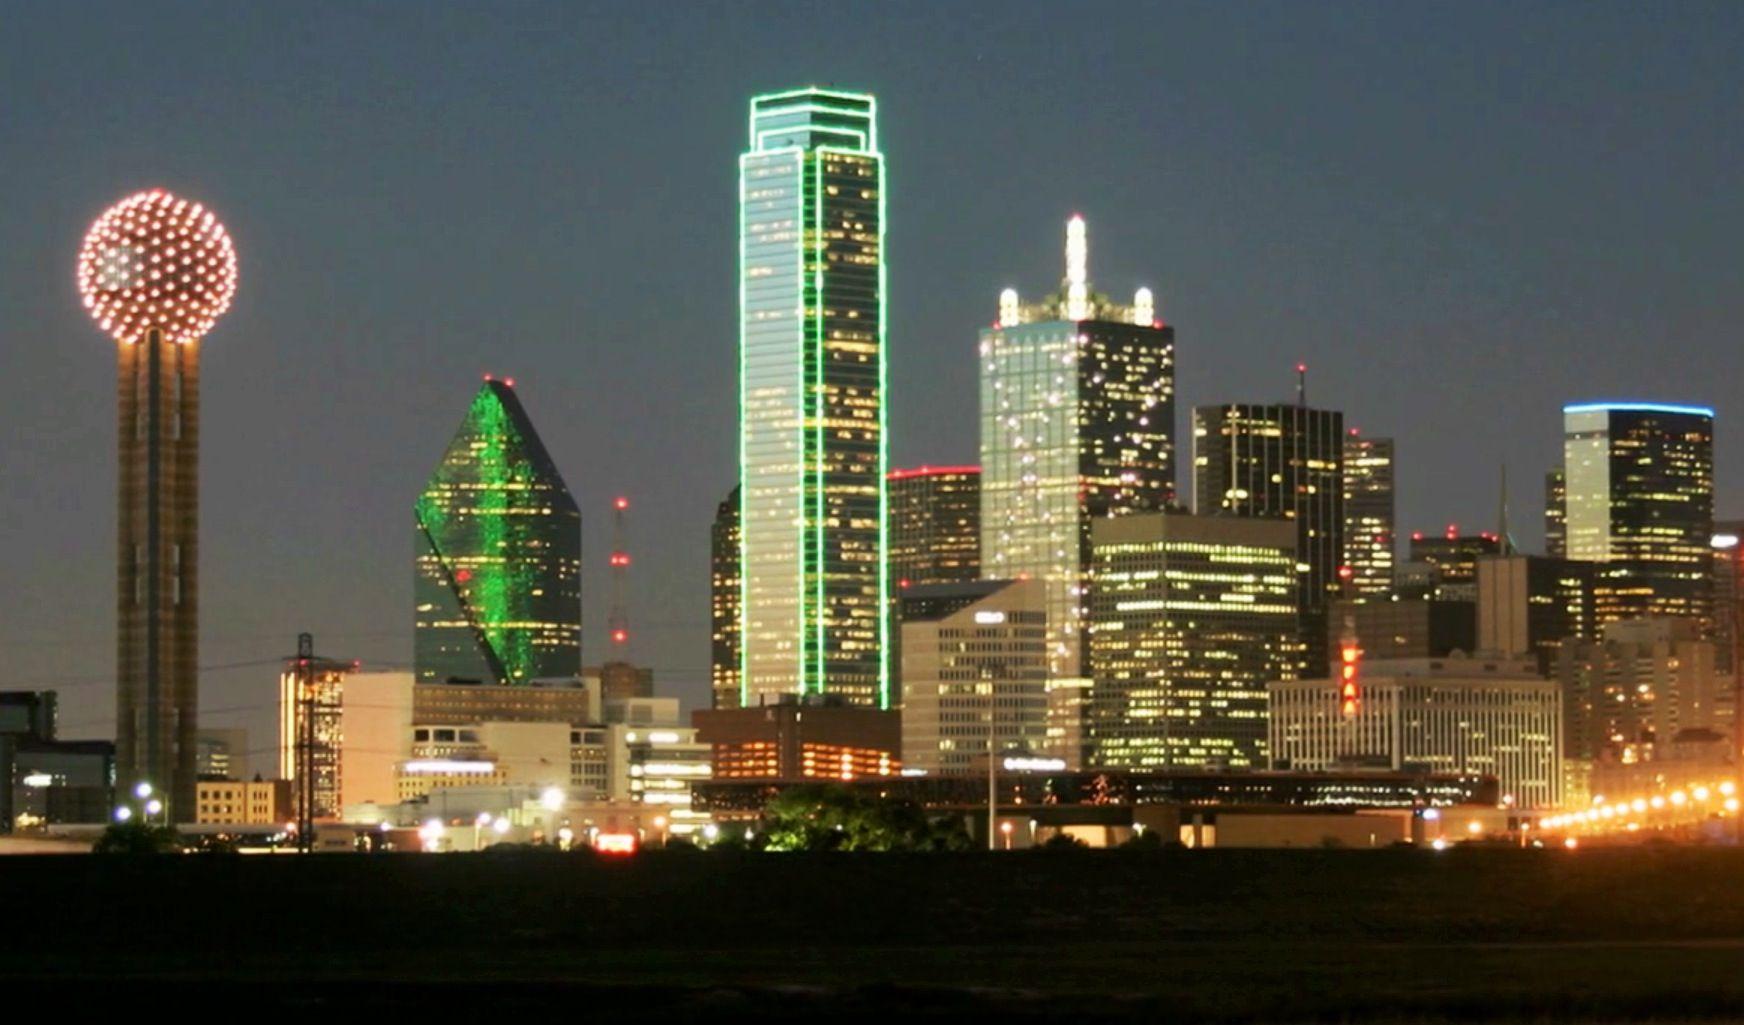 Dallas tx skylinea restaurant in in the big ball of